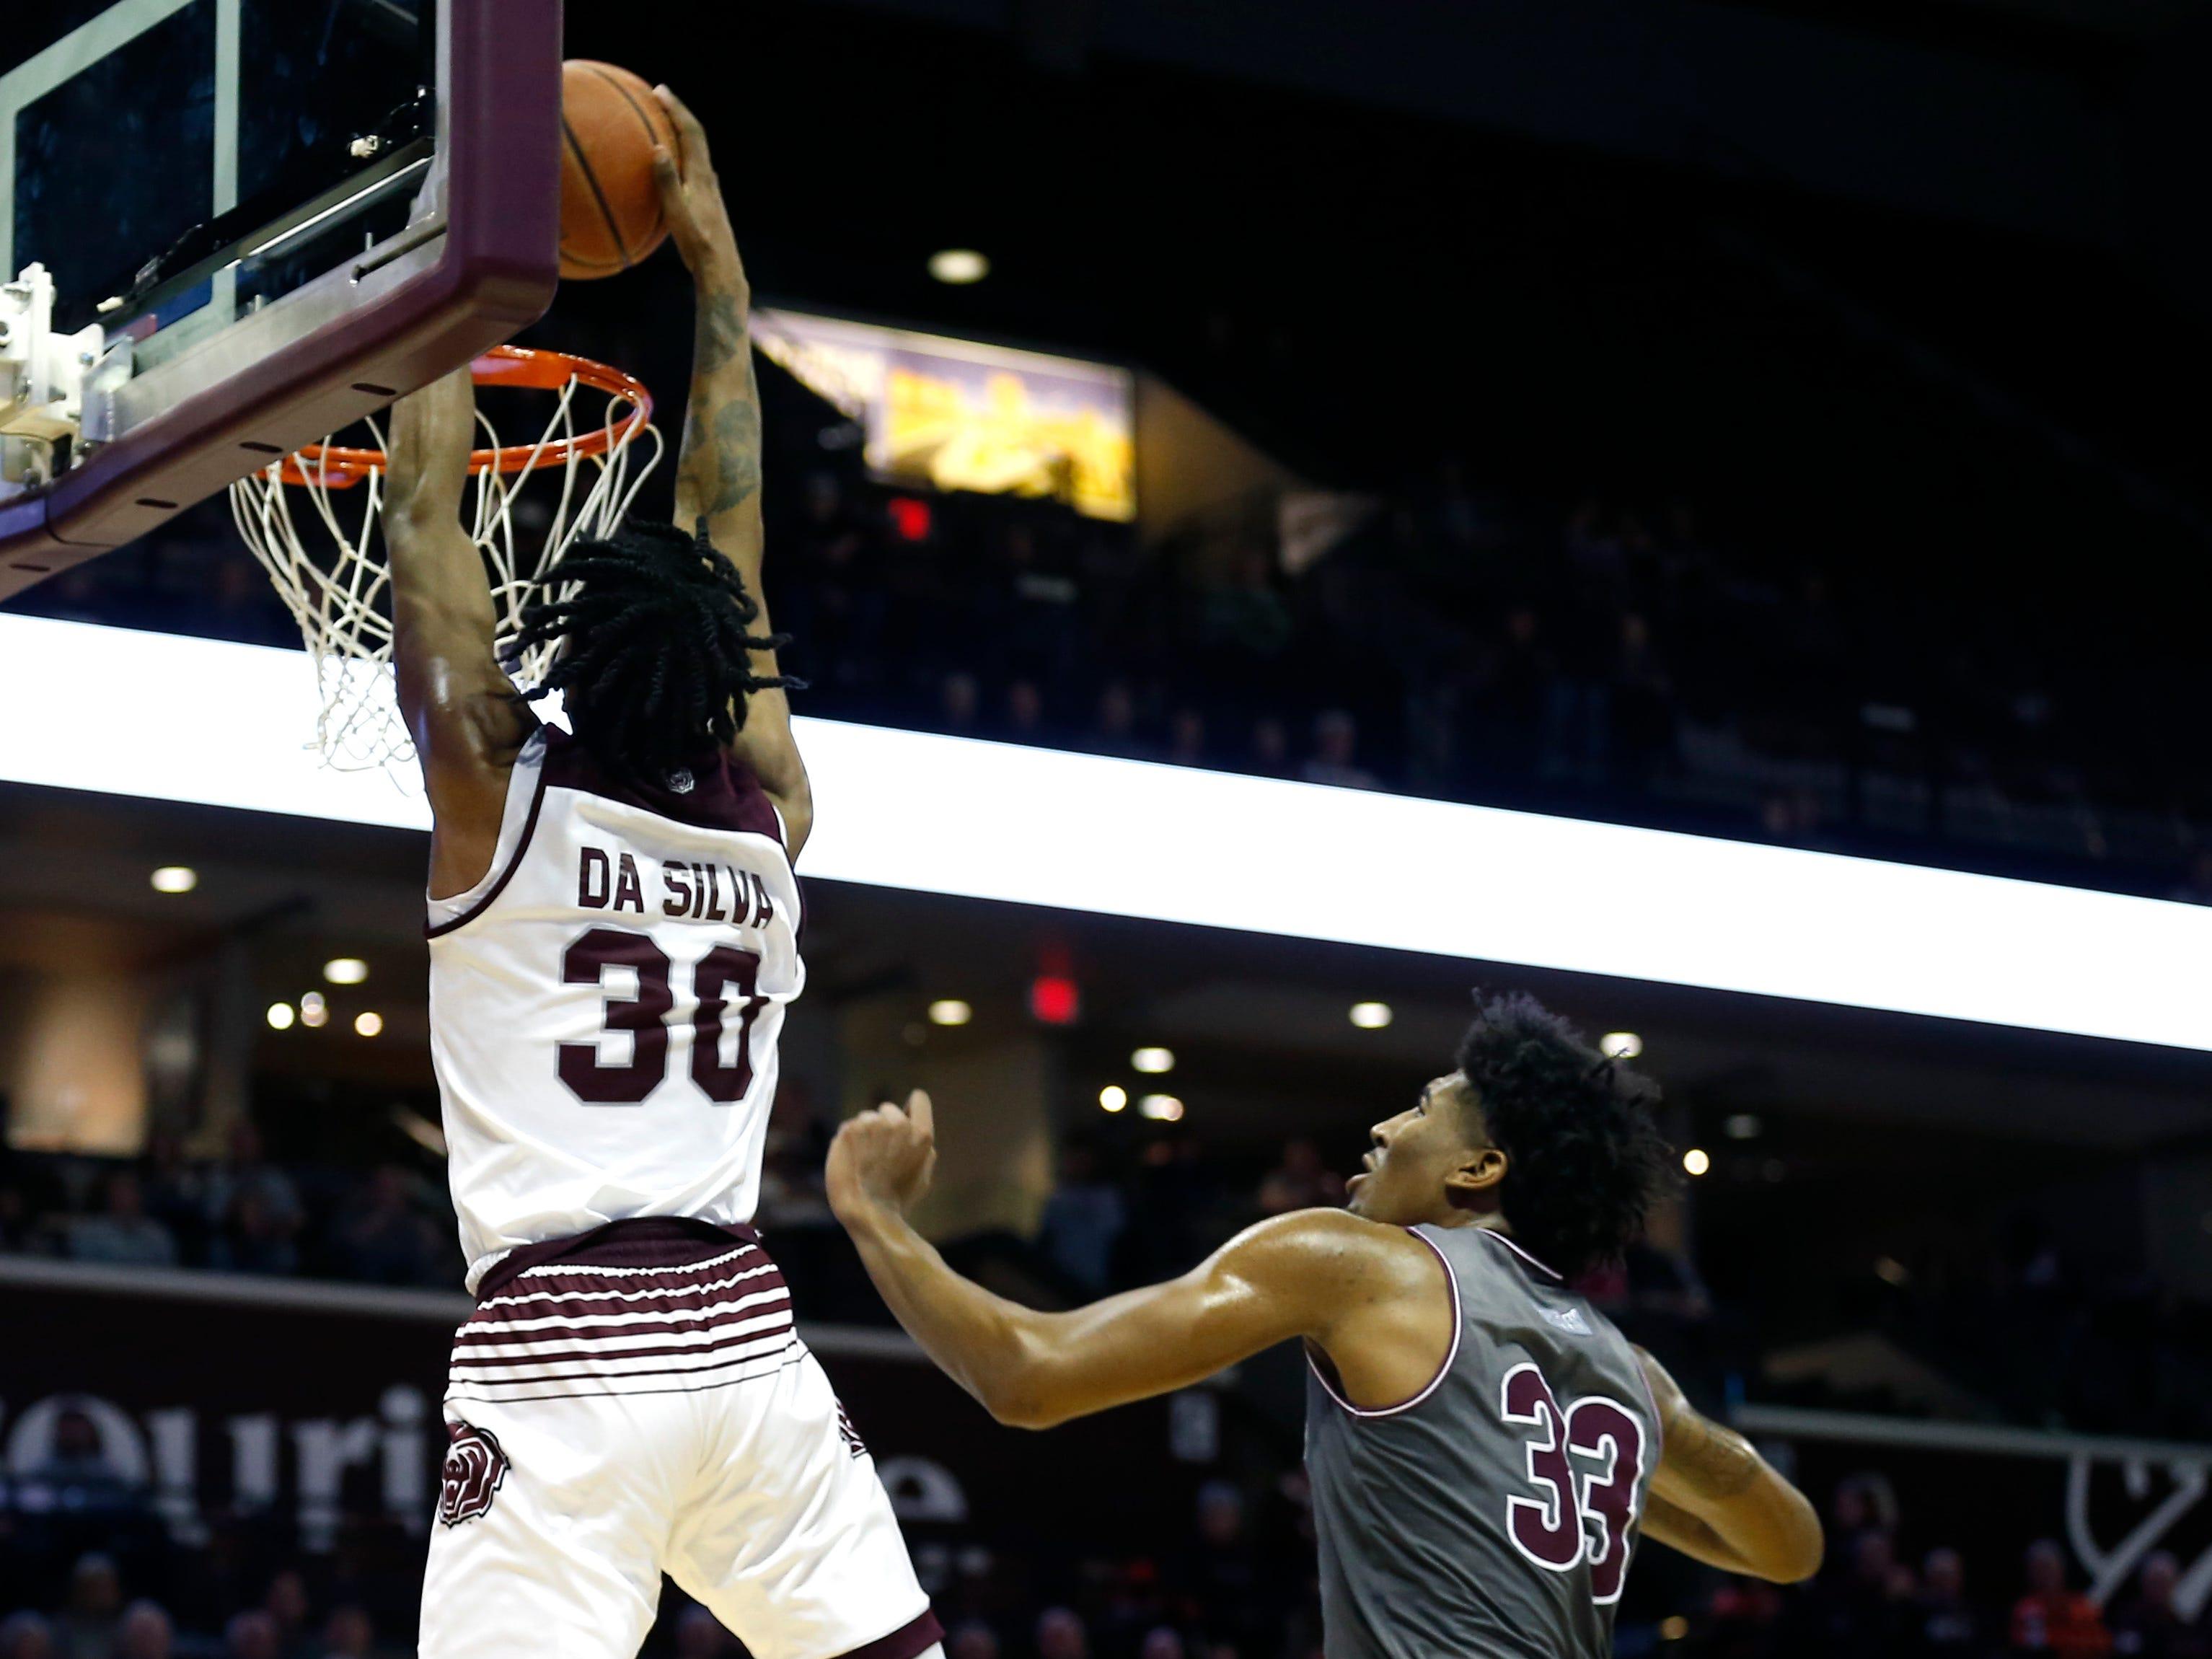 Missouri State's Tulio Da Silva dunks the ball on the Southern Illinois Salukis meet at JQH Arena on Wednesday, Feb. 6, 2019.